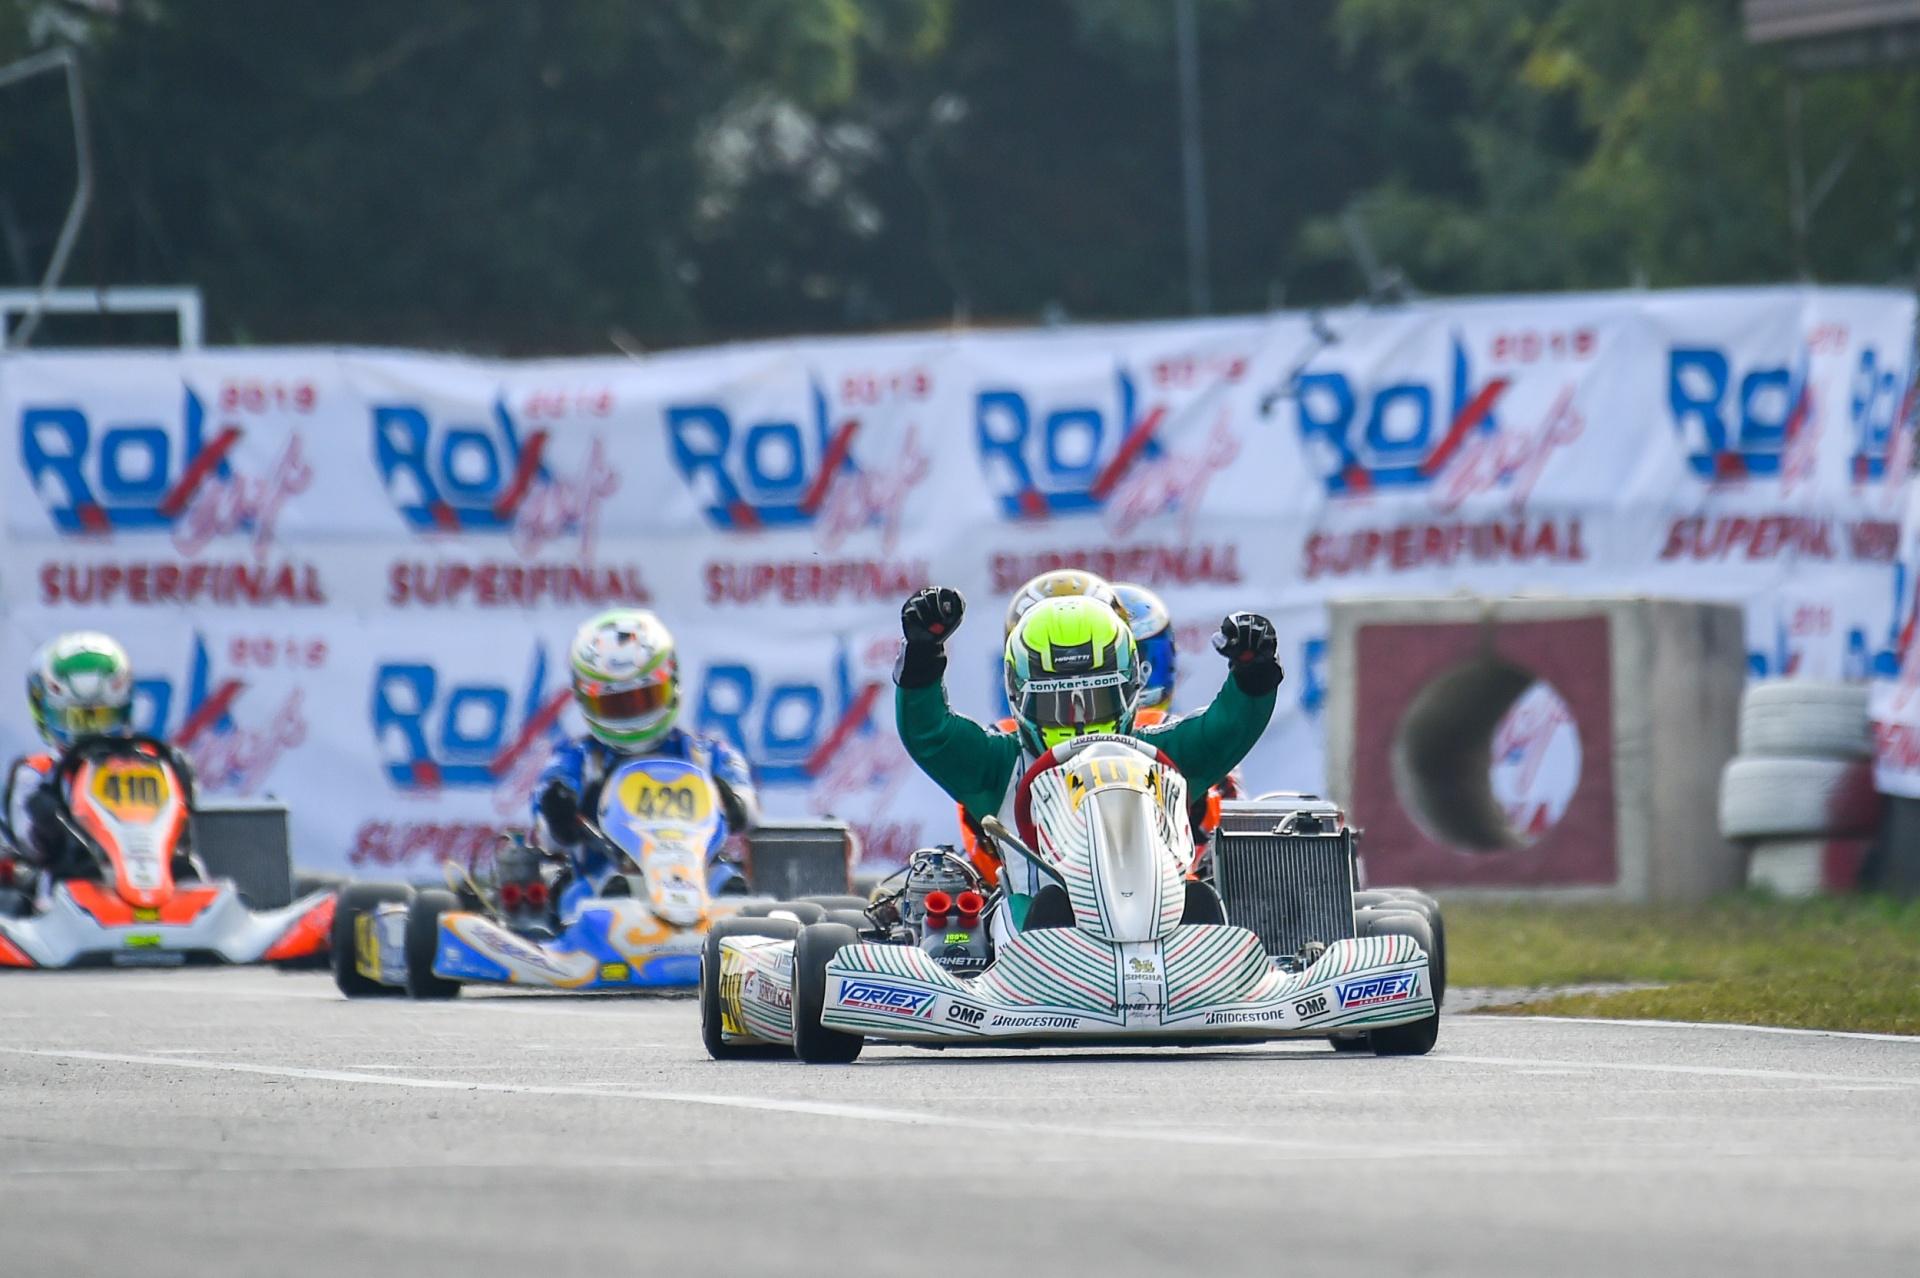 Luca Bosco World Champion 2019 ROK Cup Karting